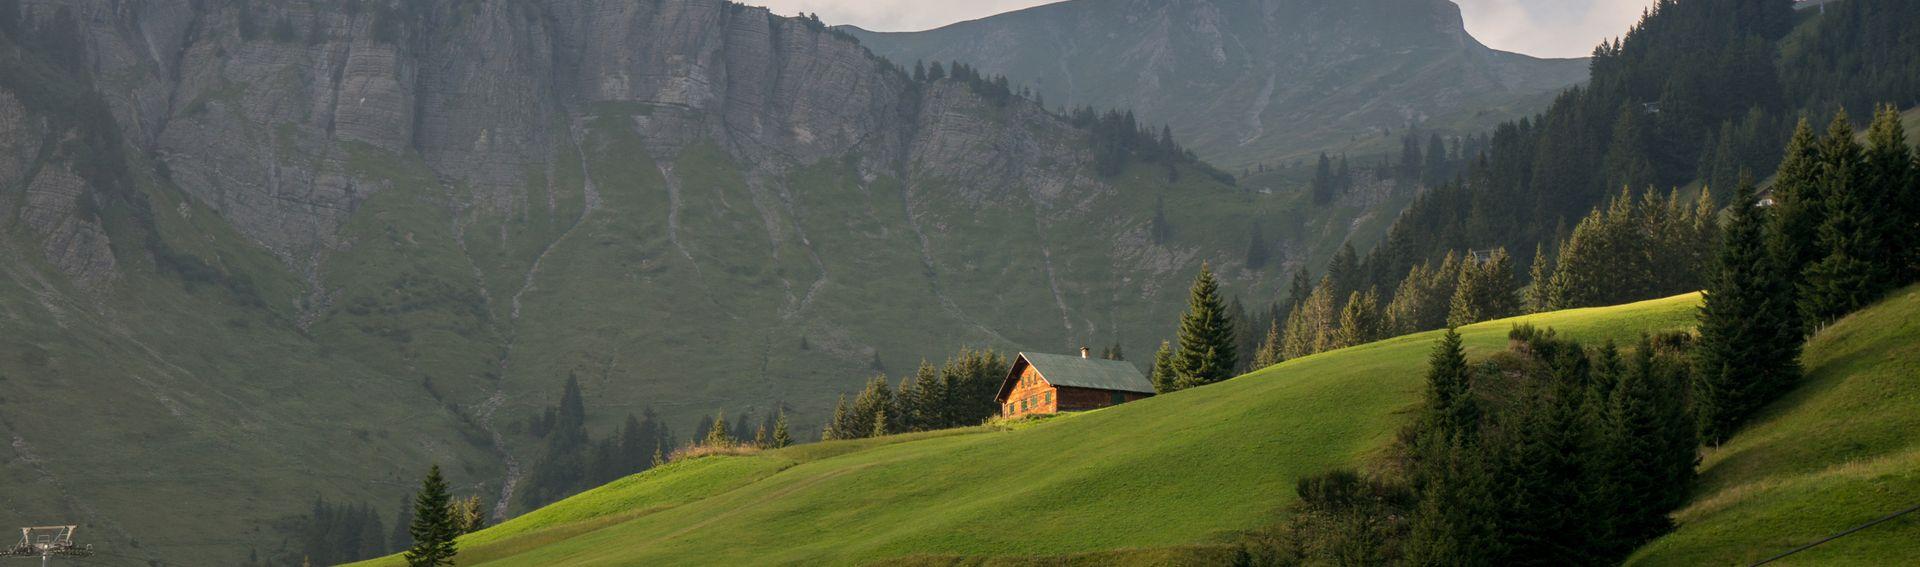 Damüls-Mellau-Faschina